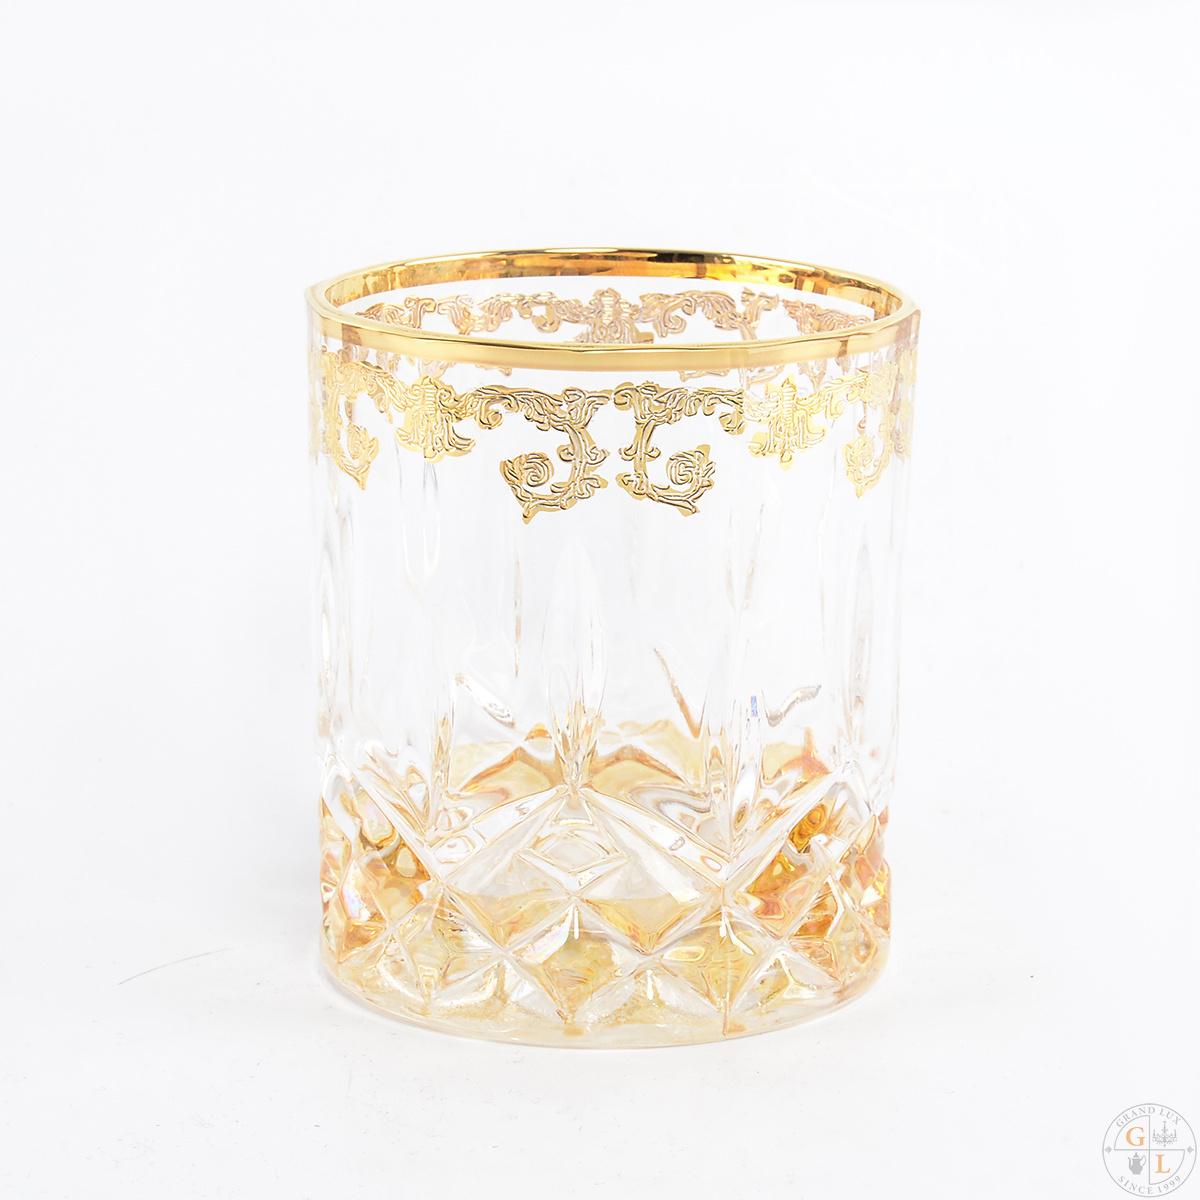 Набор стаканов для виски ADAGIO от TIMON, хрусталь, 6 шт.